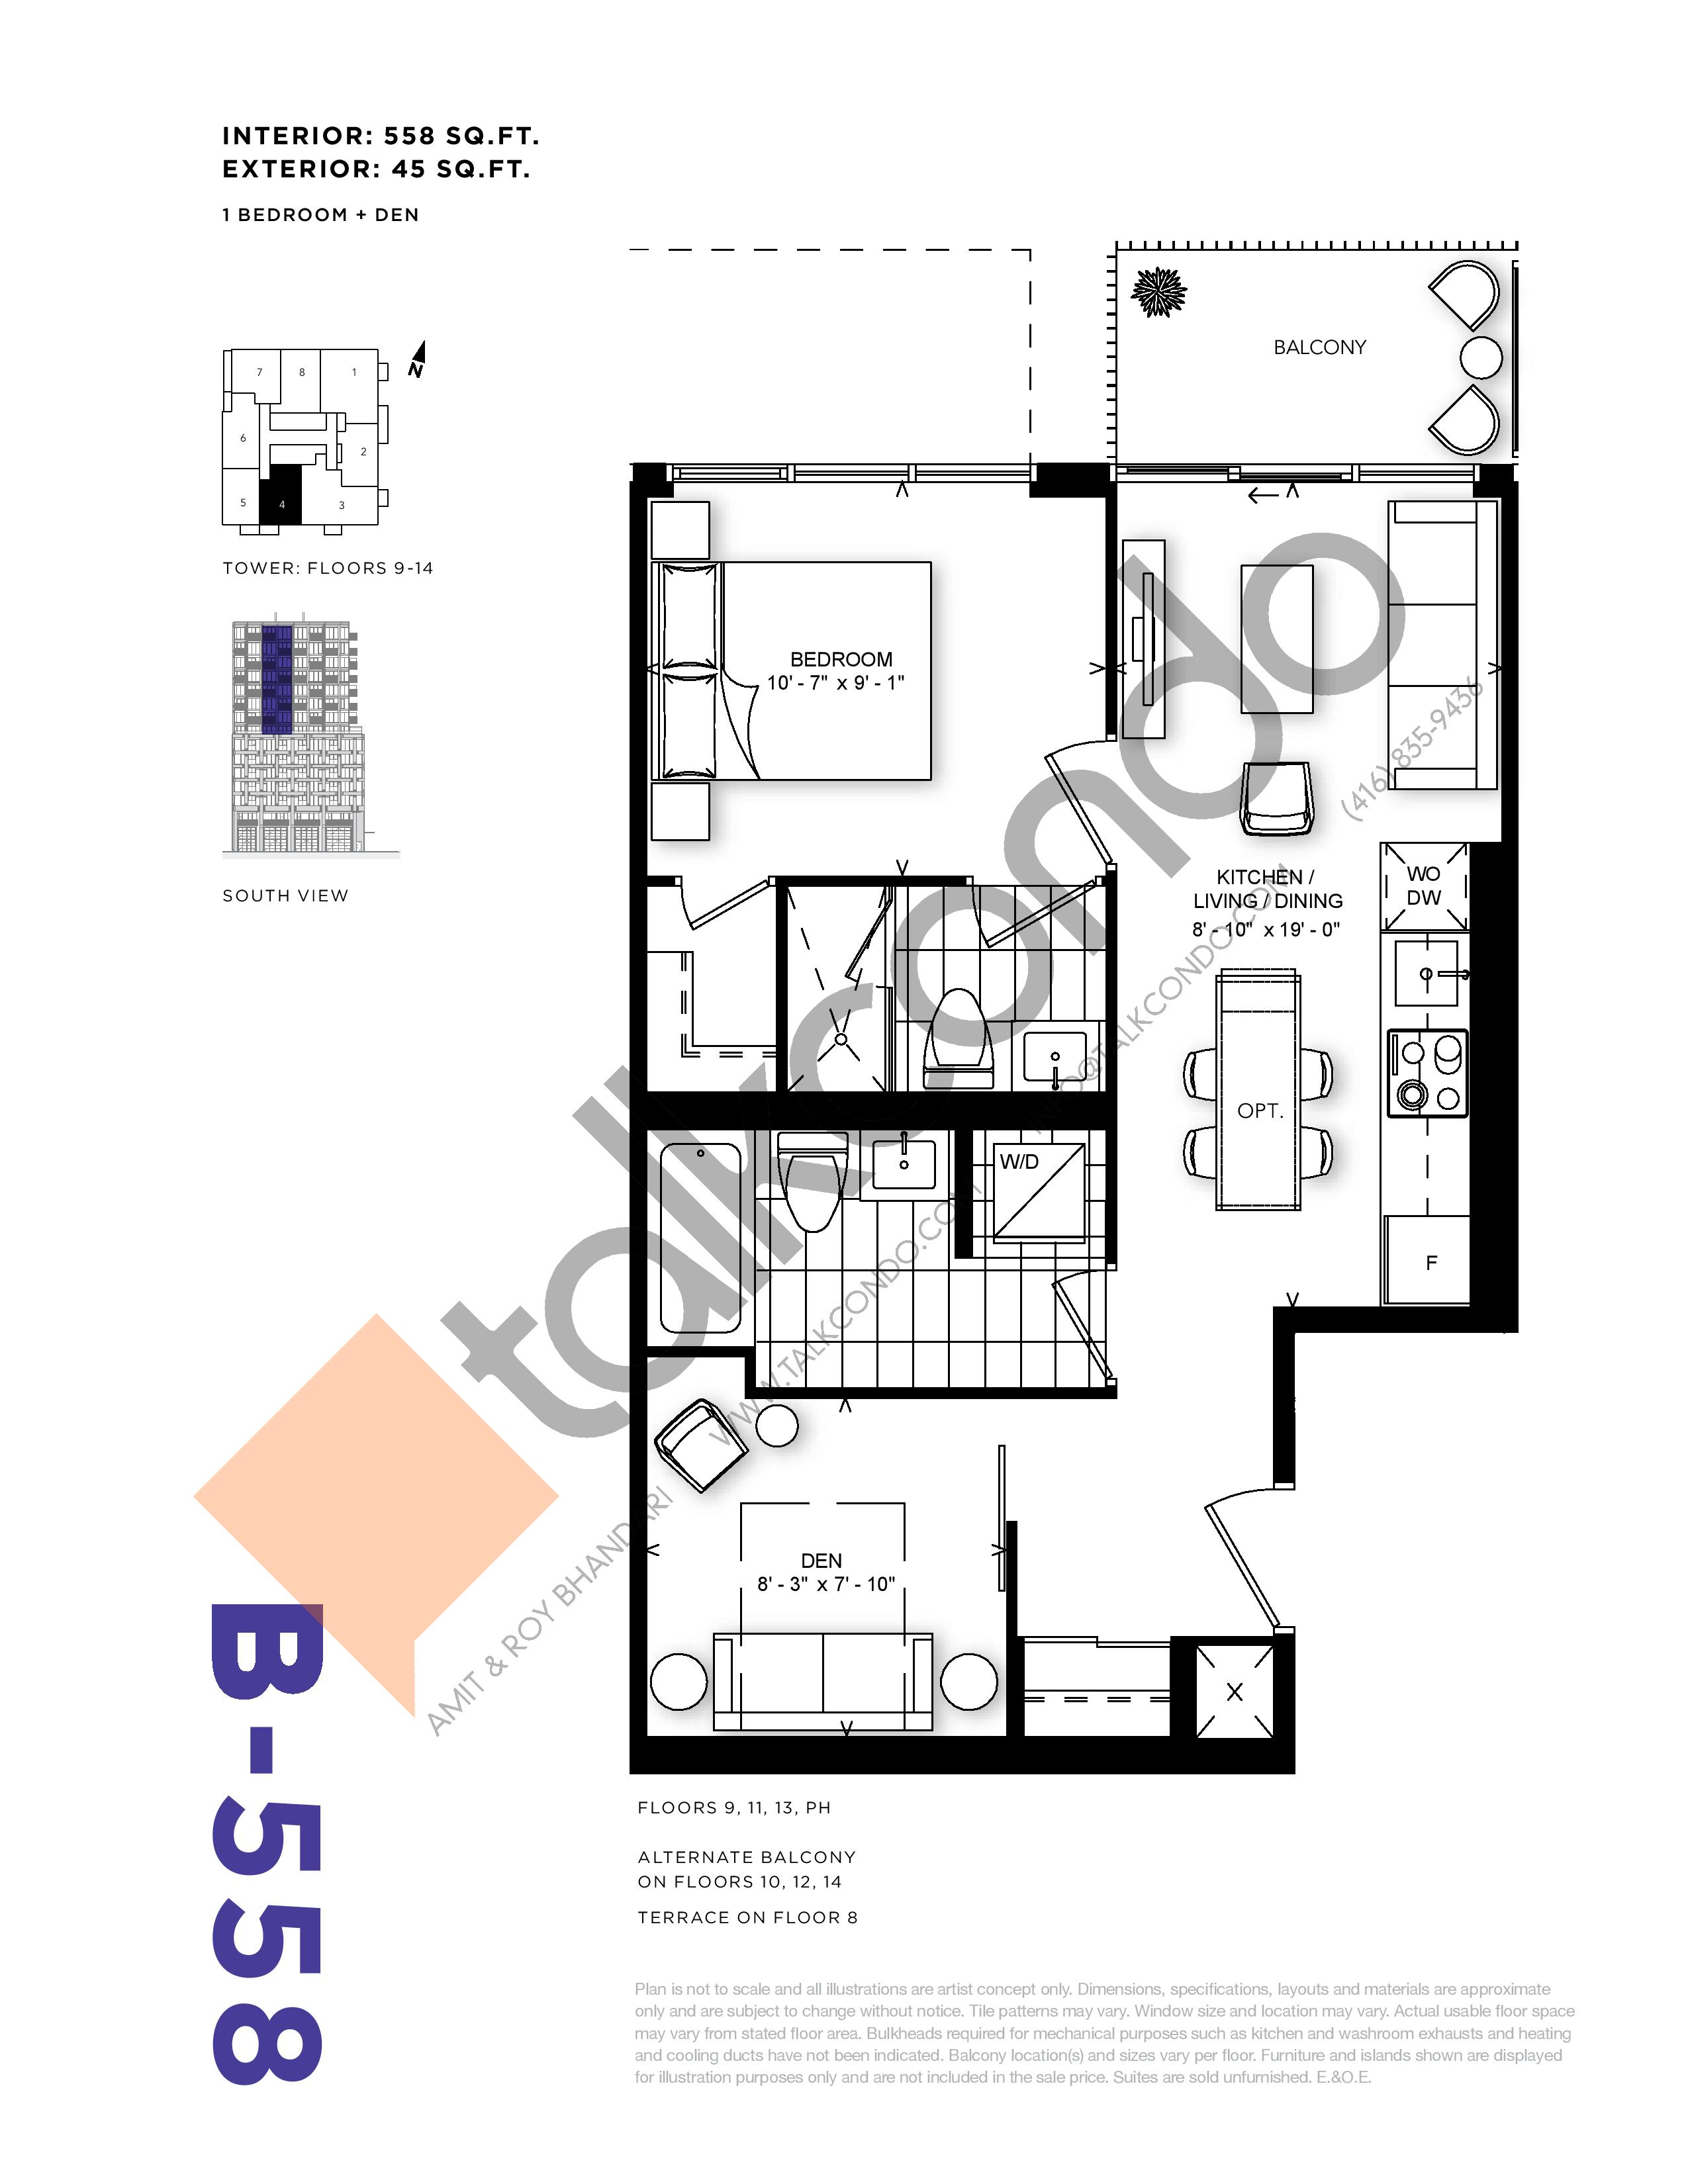 B-558 Floor Plan at RUSH Condos - 558 sq.ft